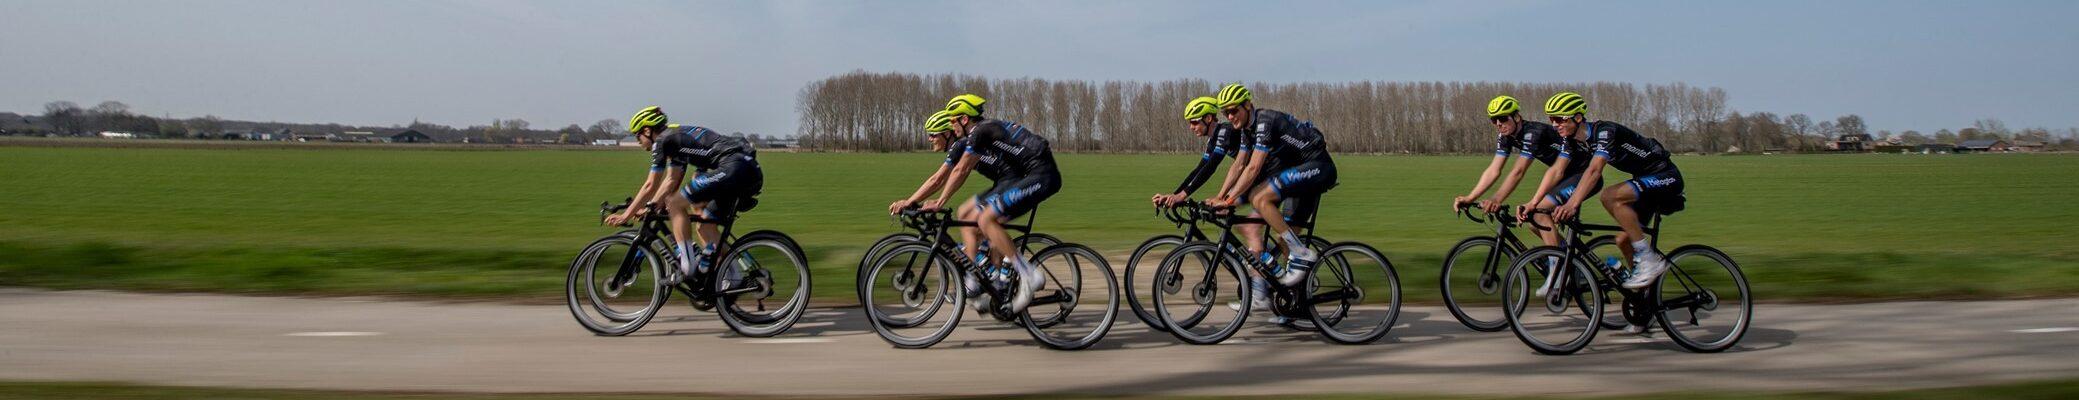 trainingskamp-maasbommel-banner-fietspad